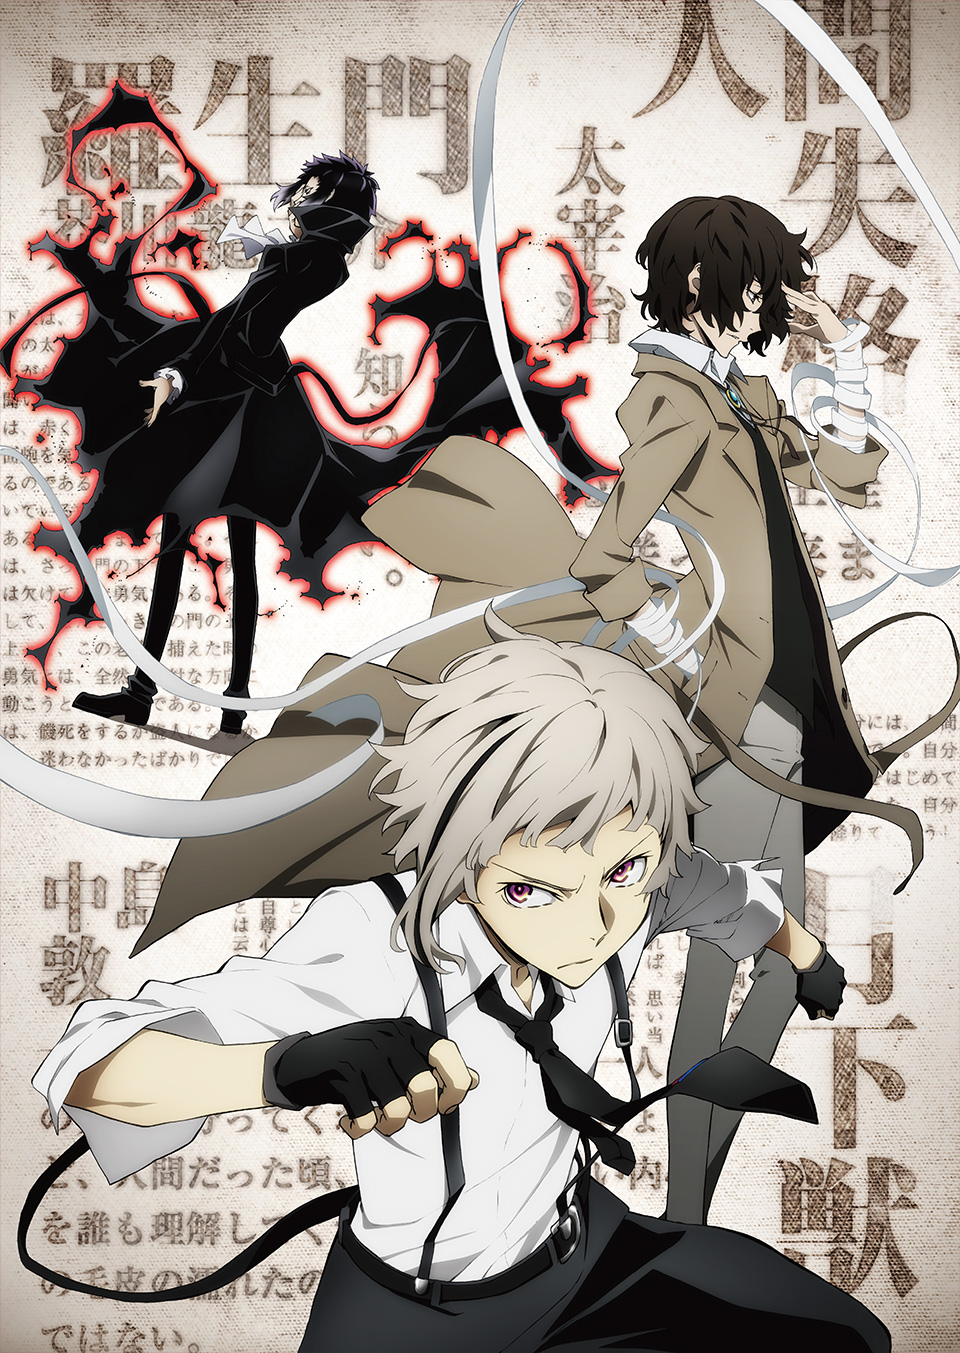 Bungou Stray Dogs anime visual